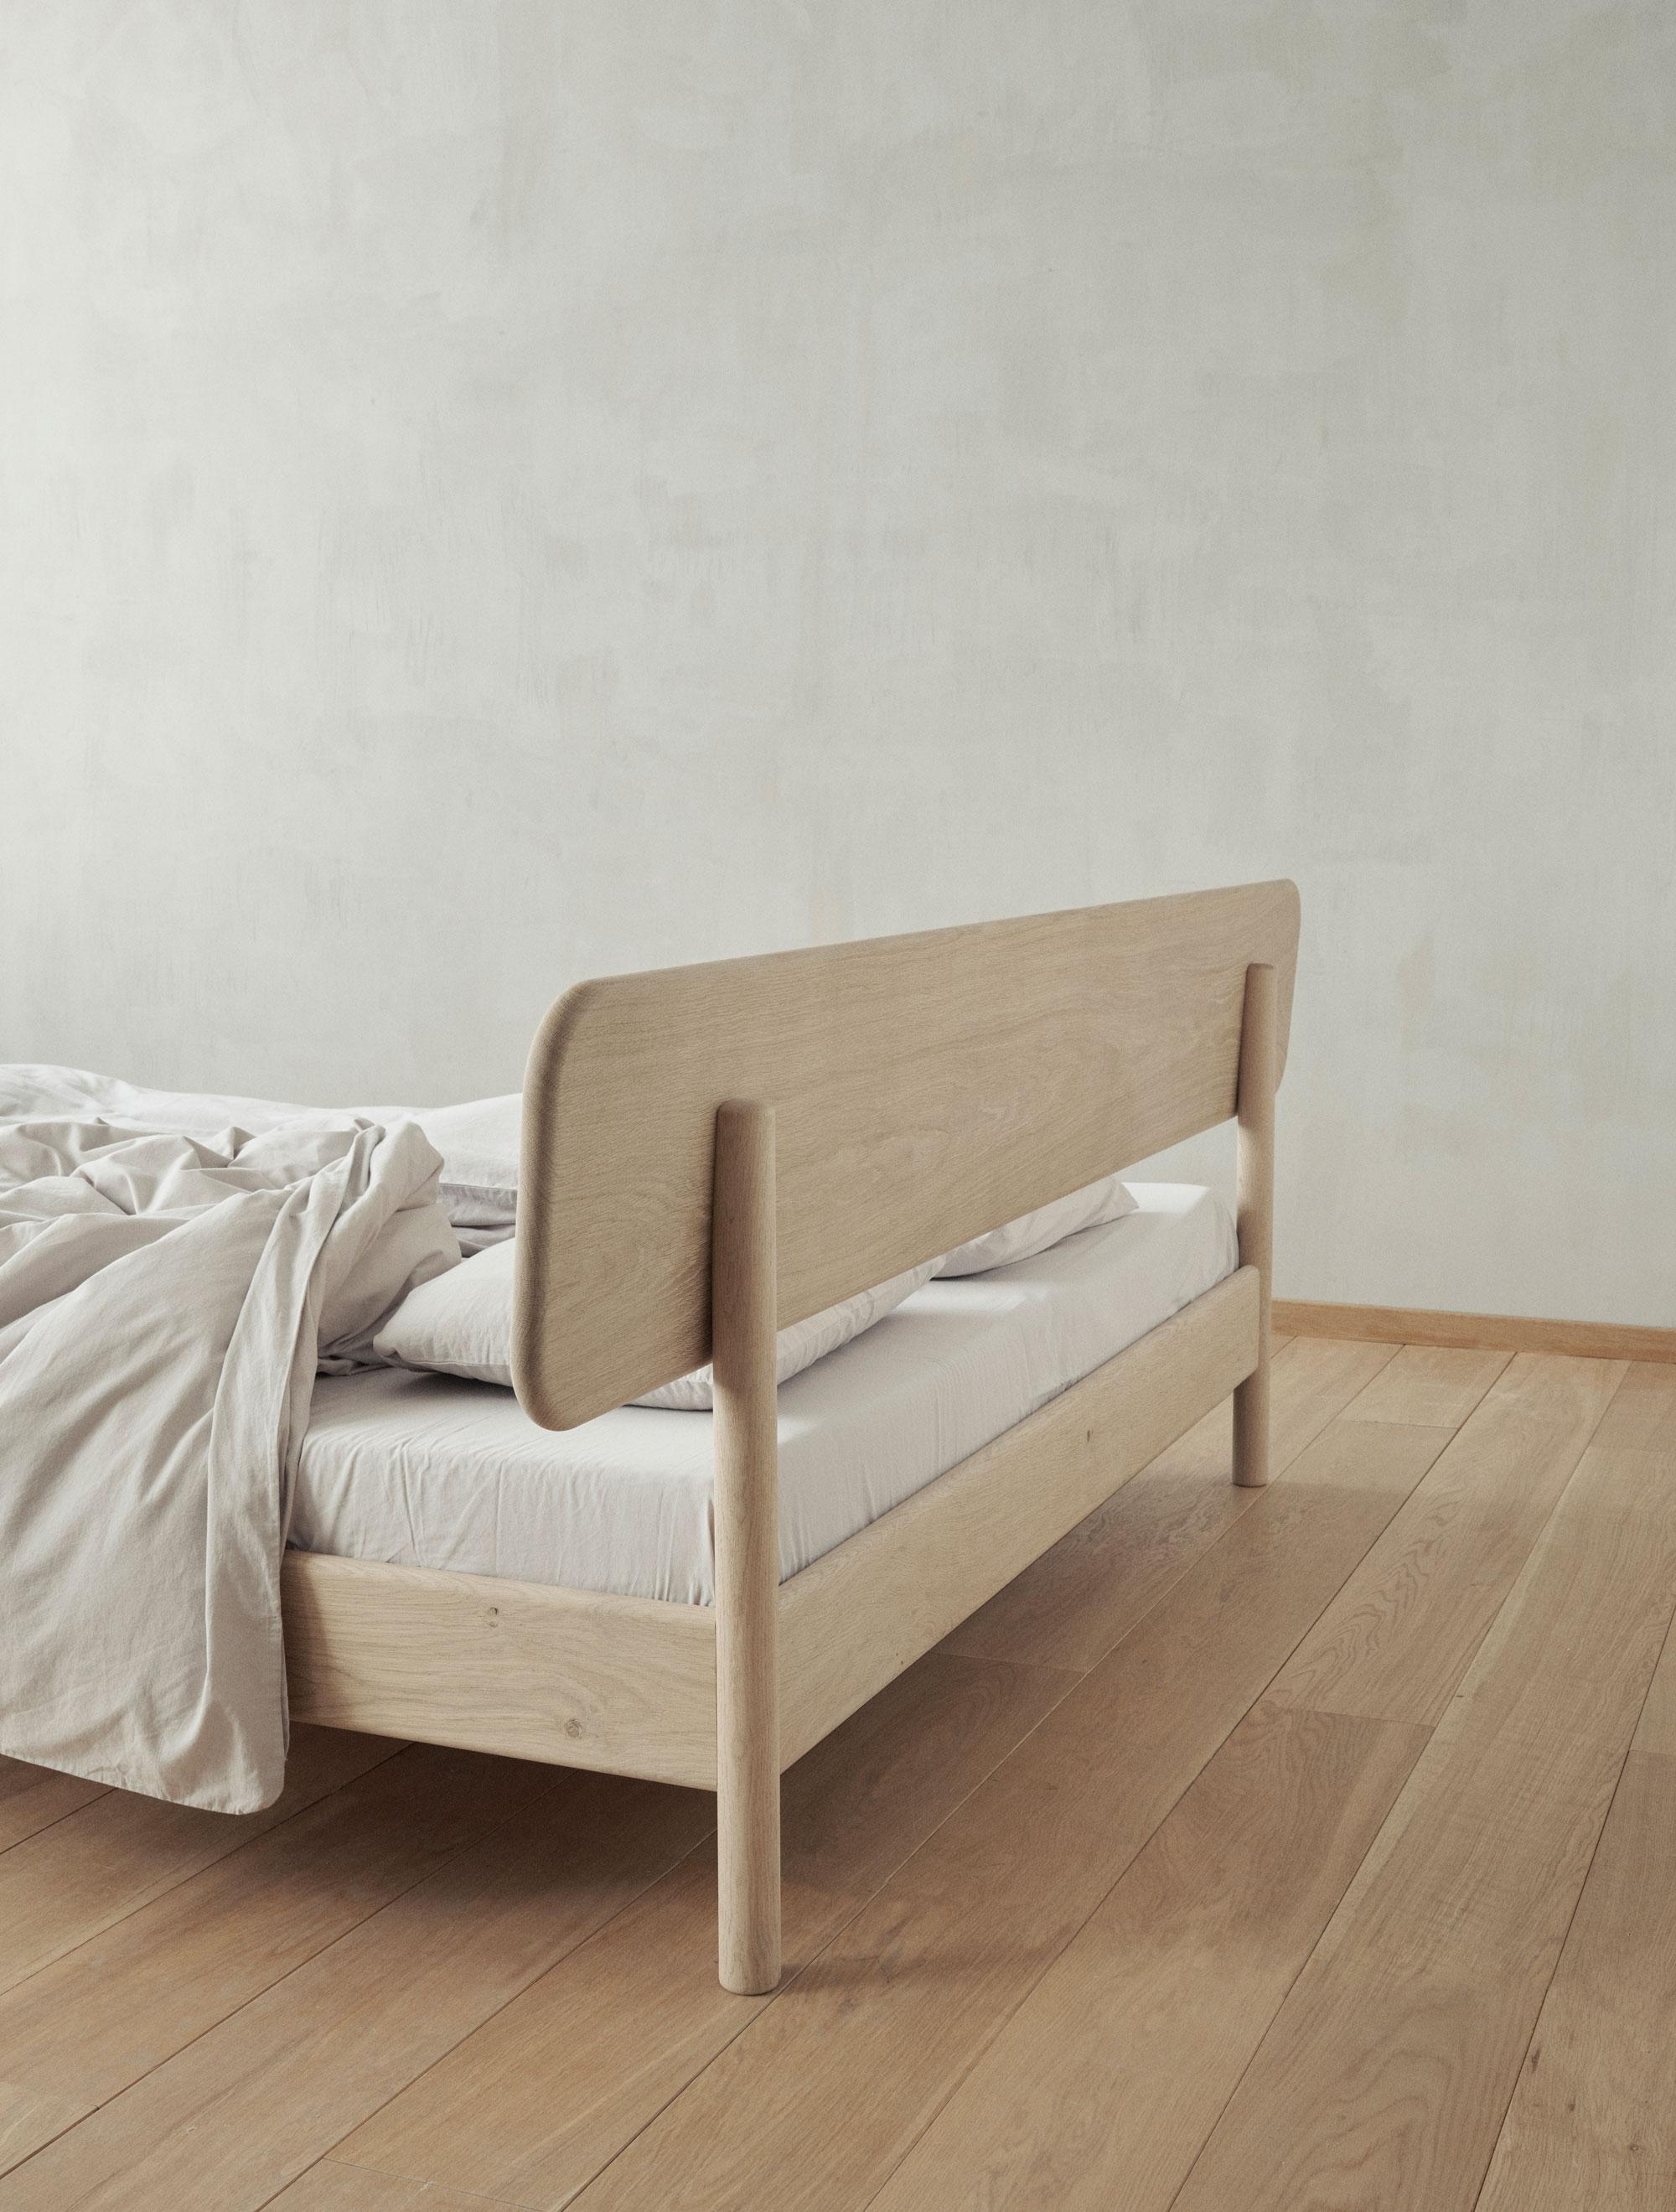 03---ALKEN-BED-AT-THE-LAB---RE-BEDS---DESIGN-BY-OLIVER-&-LUKAS-WEISSKROGH.jpg